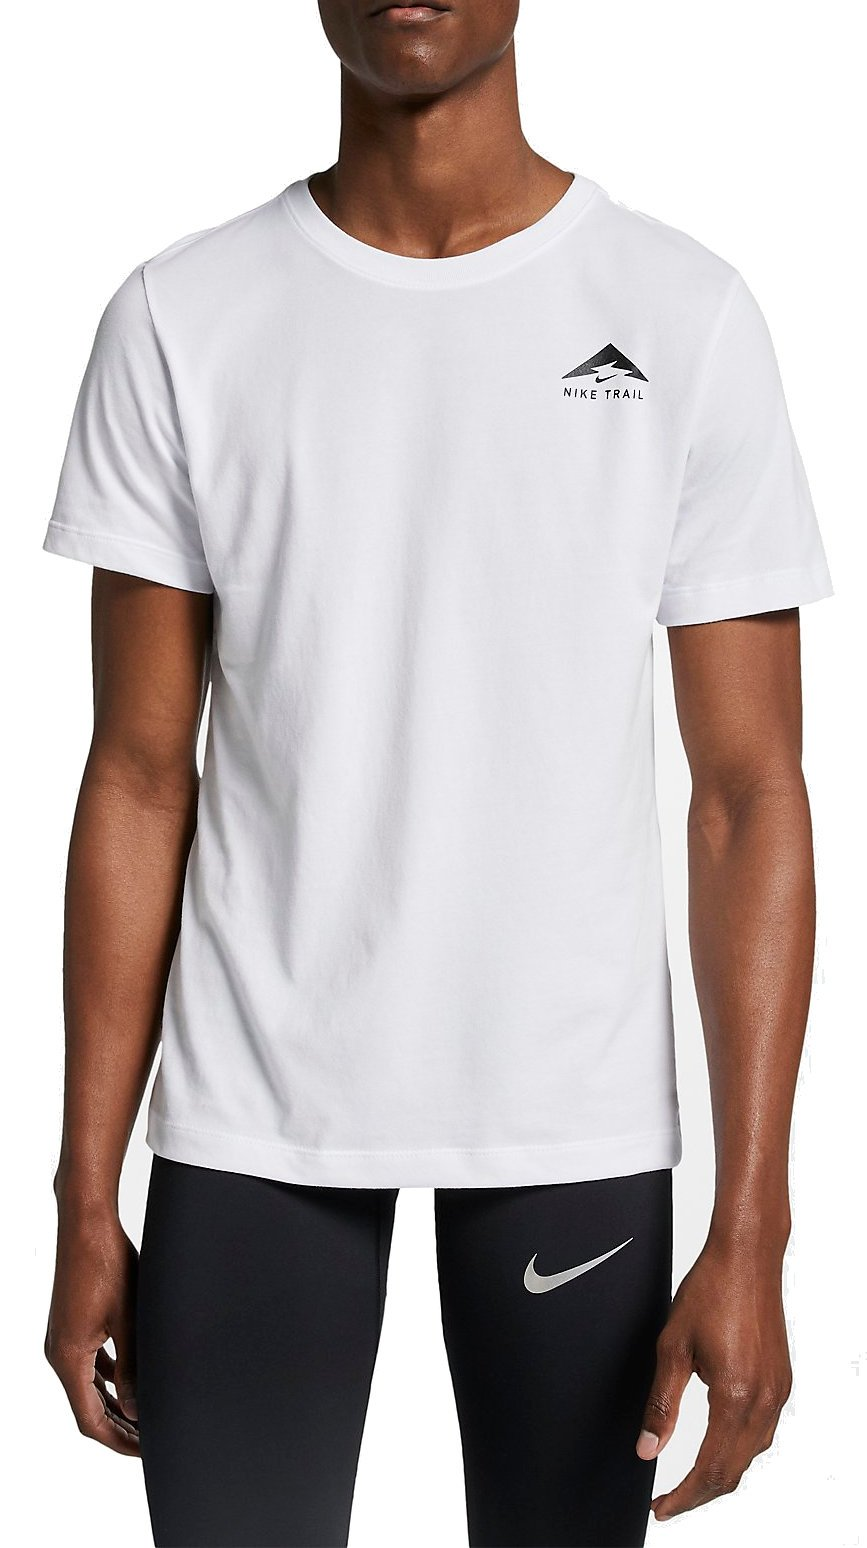 T shirt Nike M NK RUN DCFT TRAIL LOGO TEE